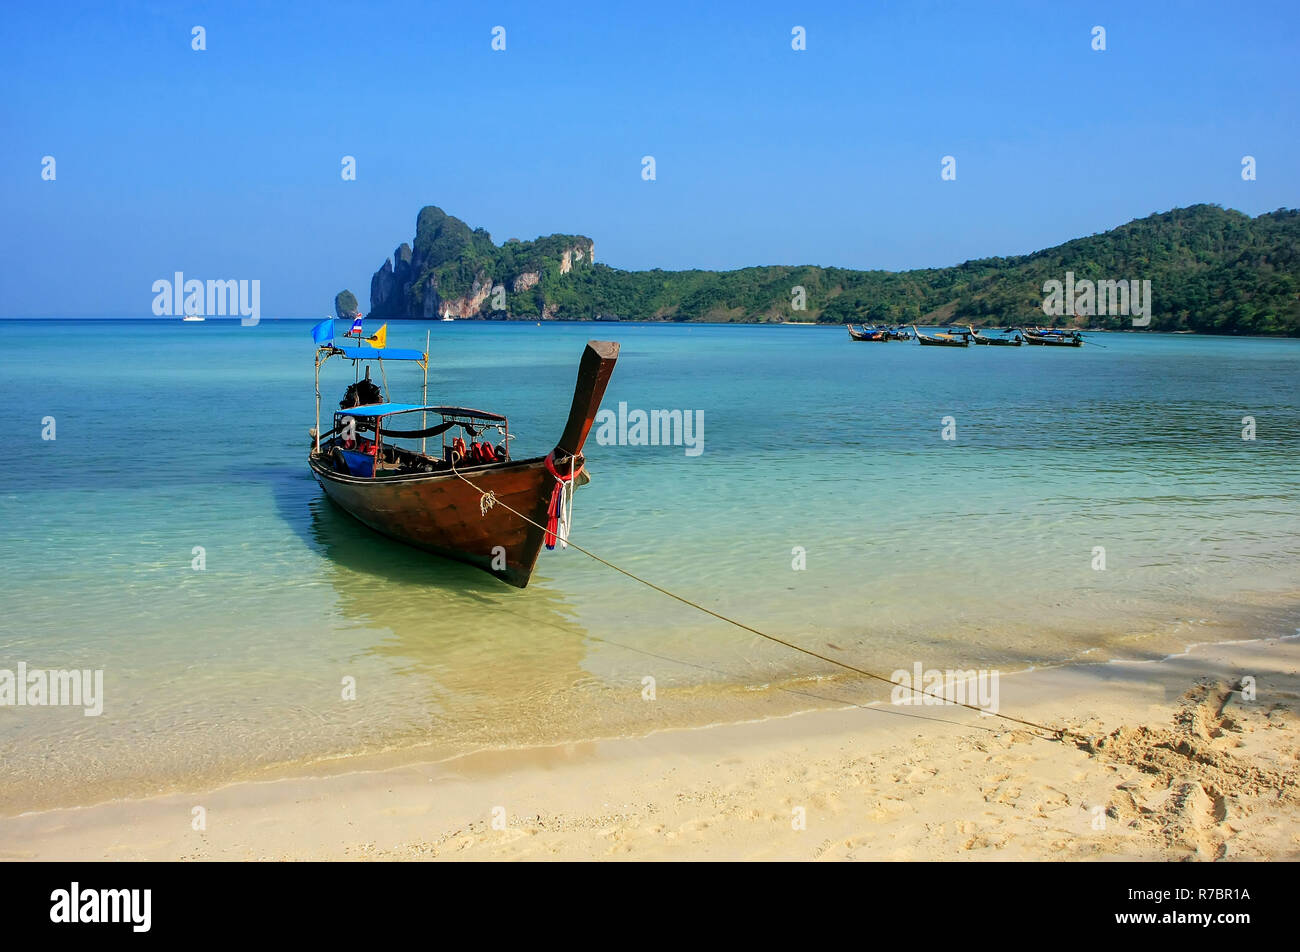 Phi Phi Islands Beaches Loh Dalum Tonsai Bay Long Beach: Longtail Boat Anchored Stock Photos & Longtail Boat